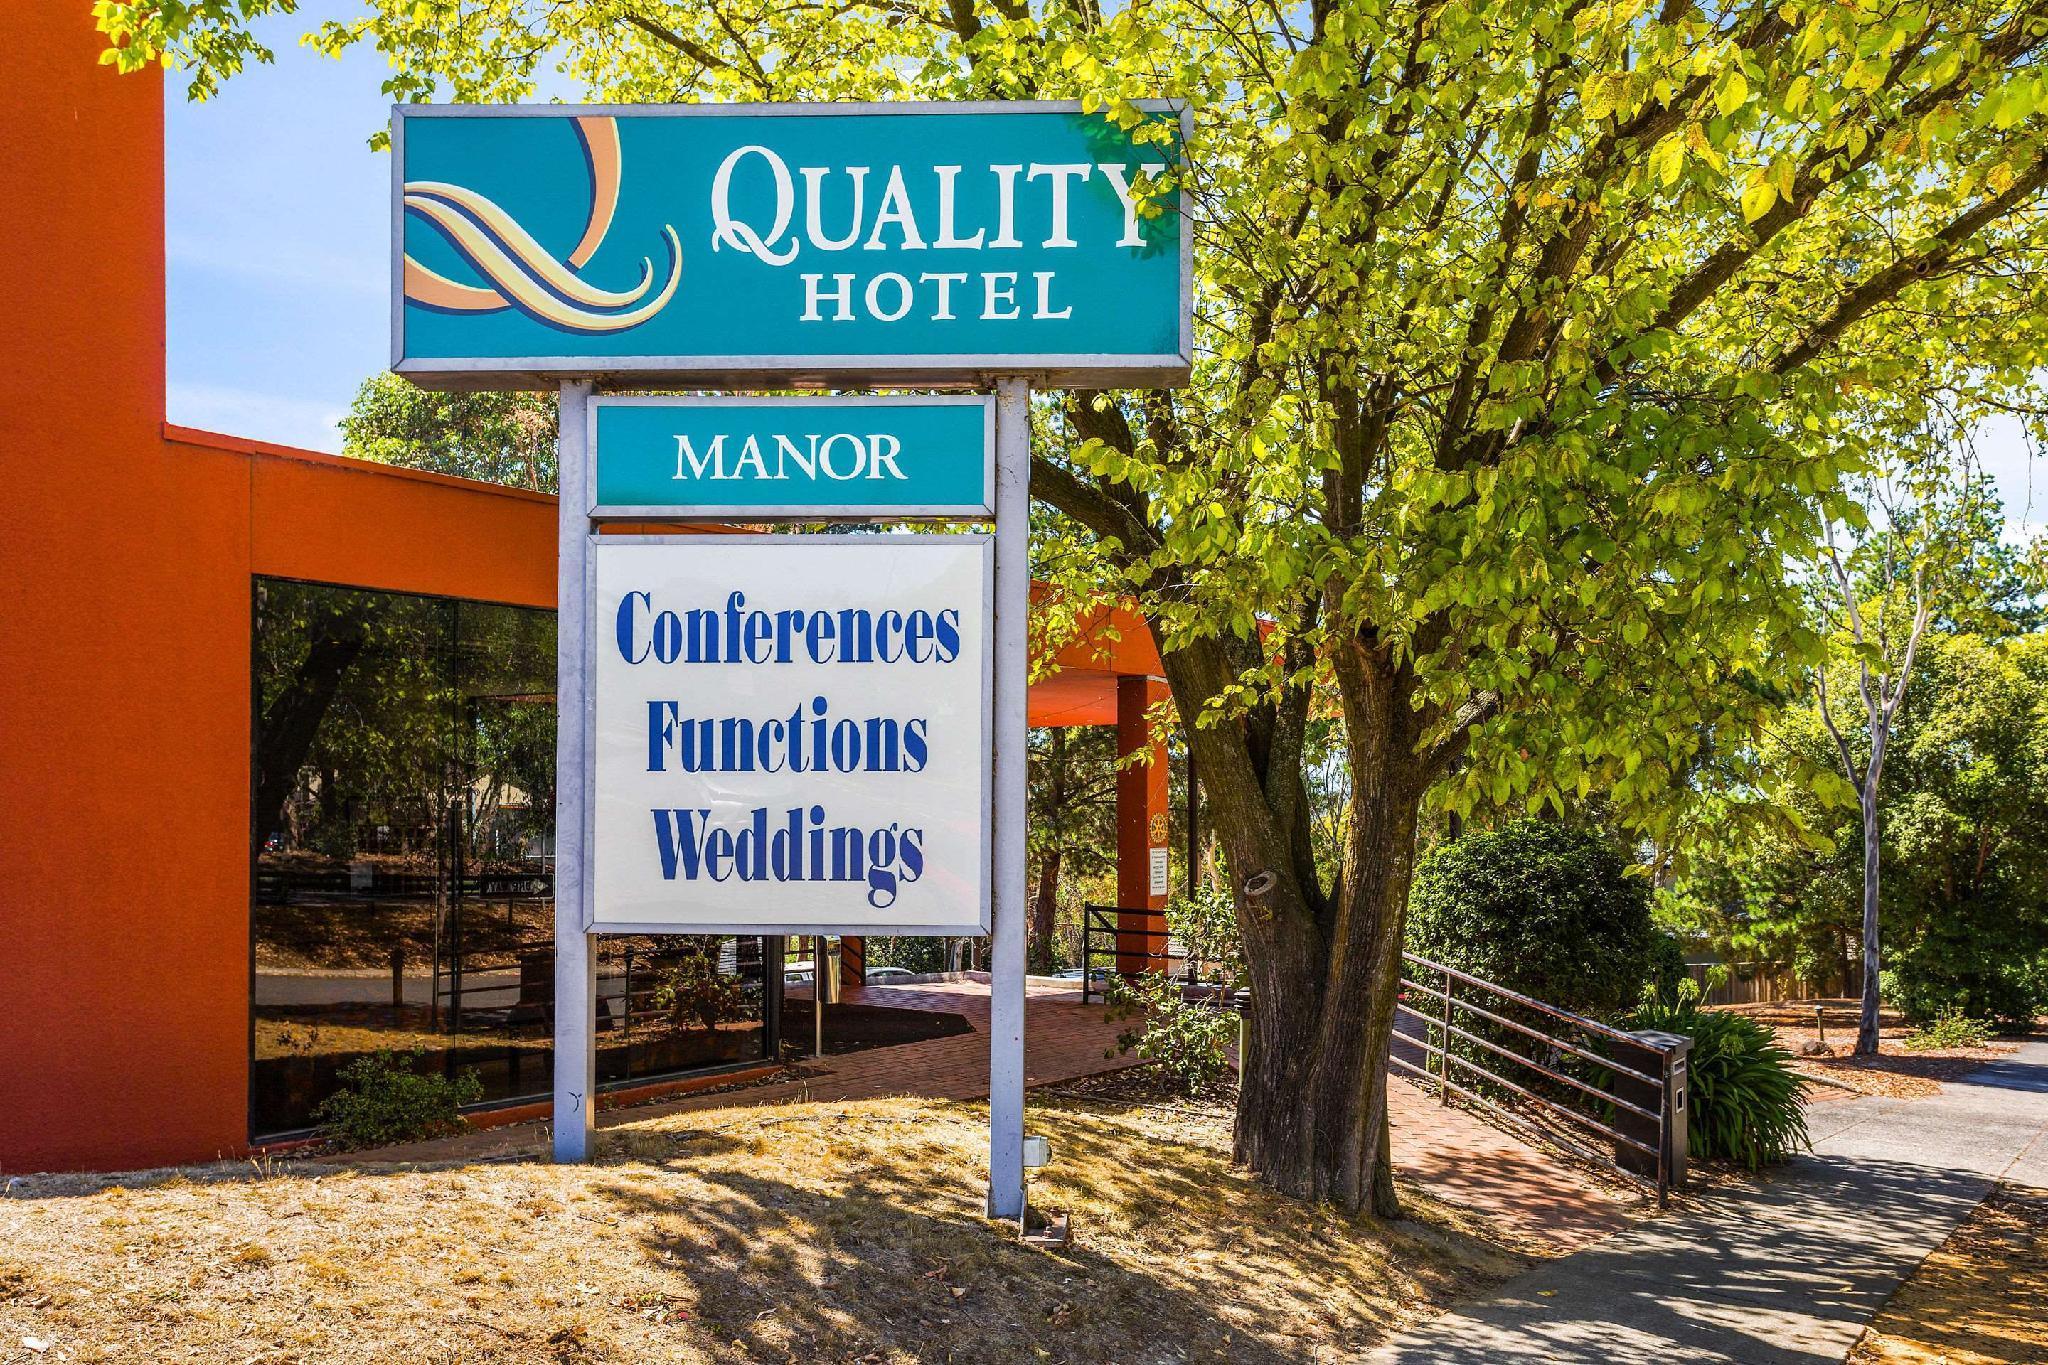 Quality Hotel Manor